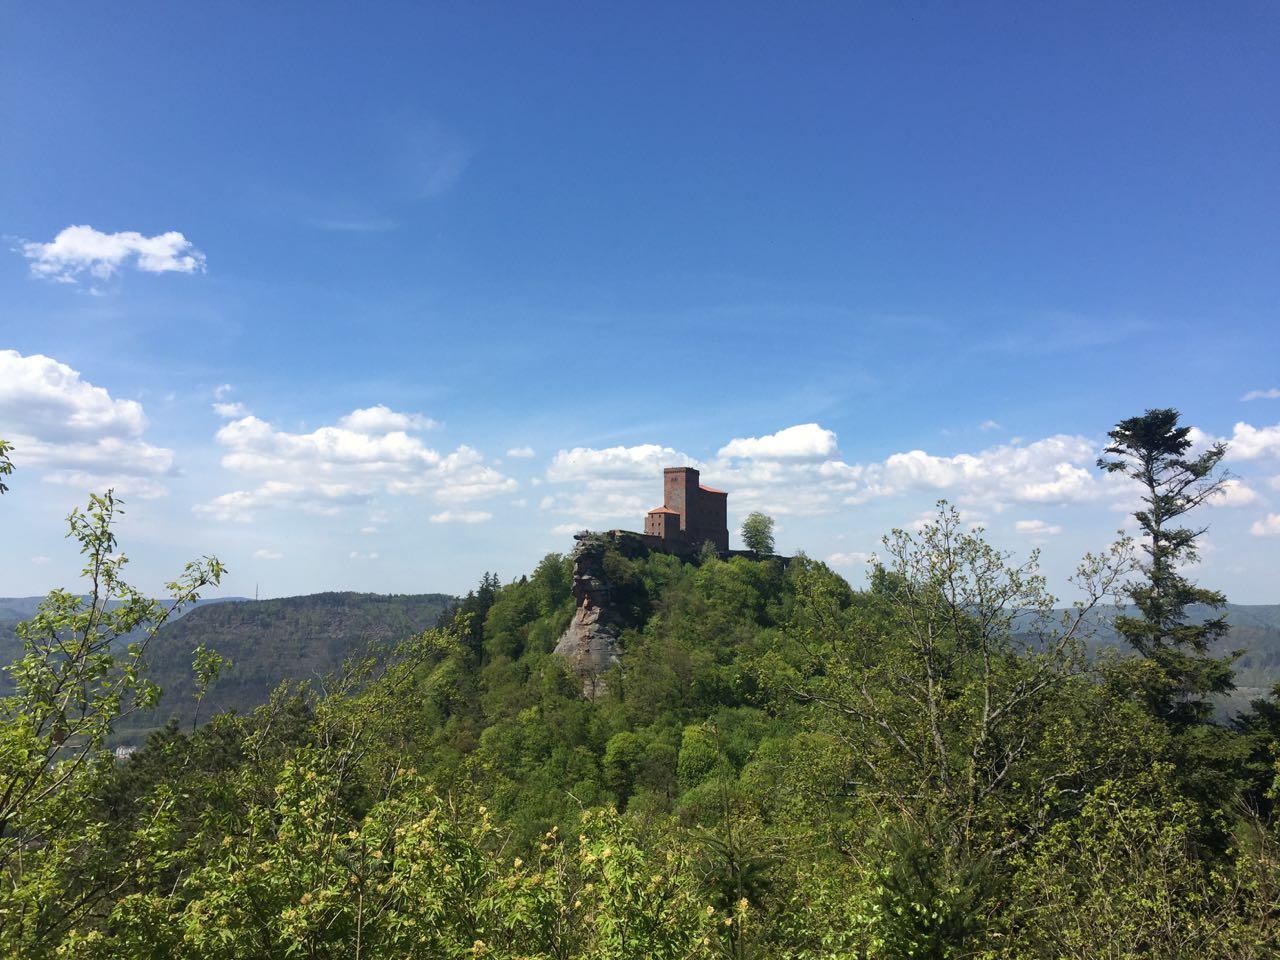 Trifels Richard Löwenherz Weg